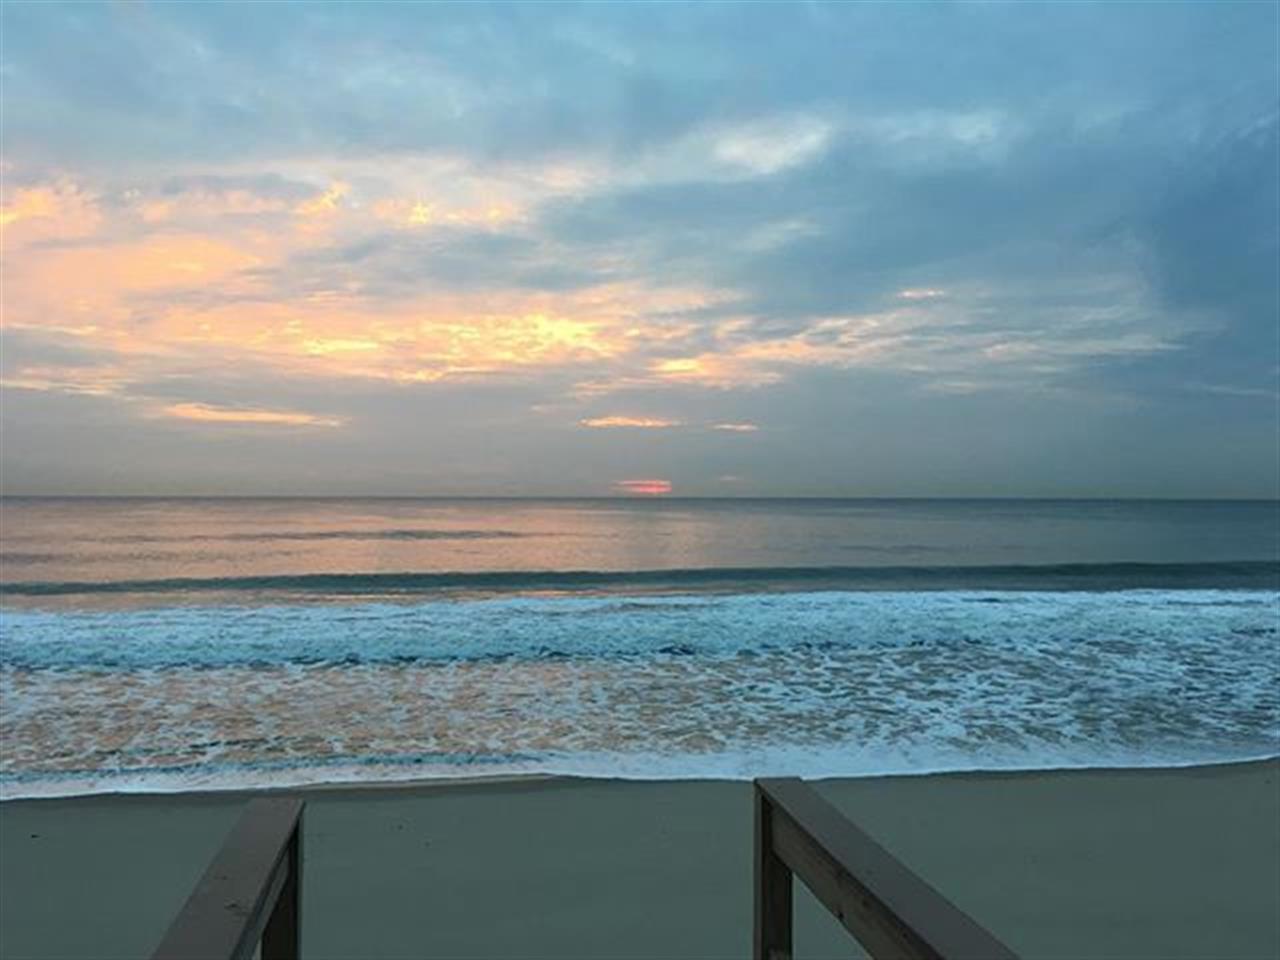 Sunrise at the beach... #nj #goodmorning #sunrise #beaches #jshn #leadingrelocal